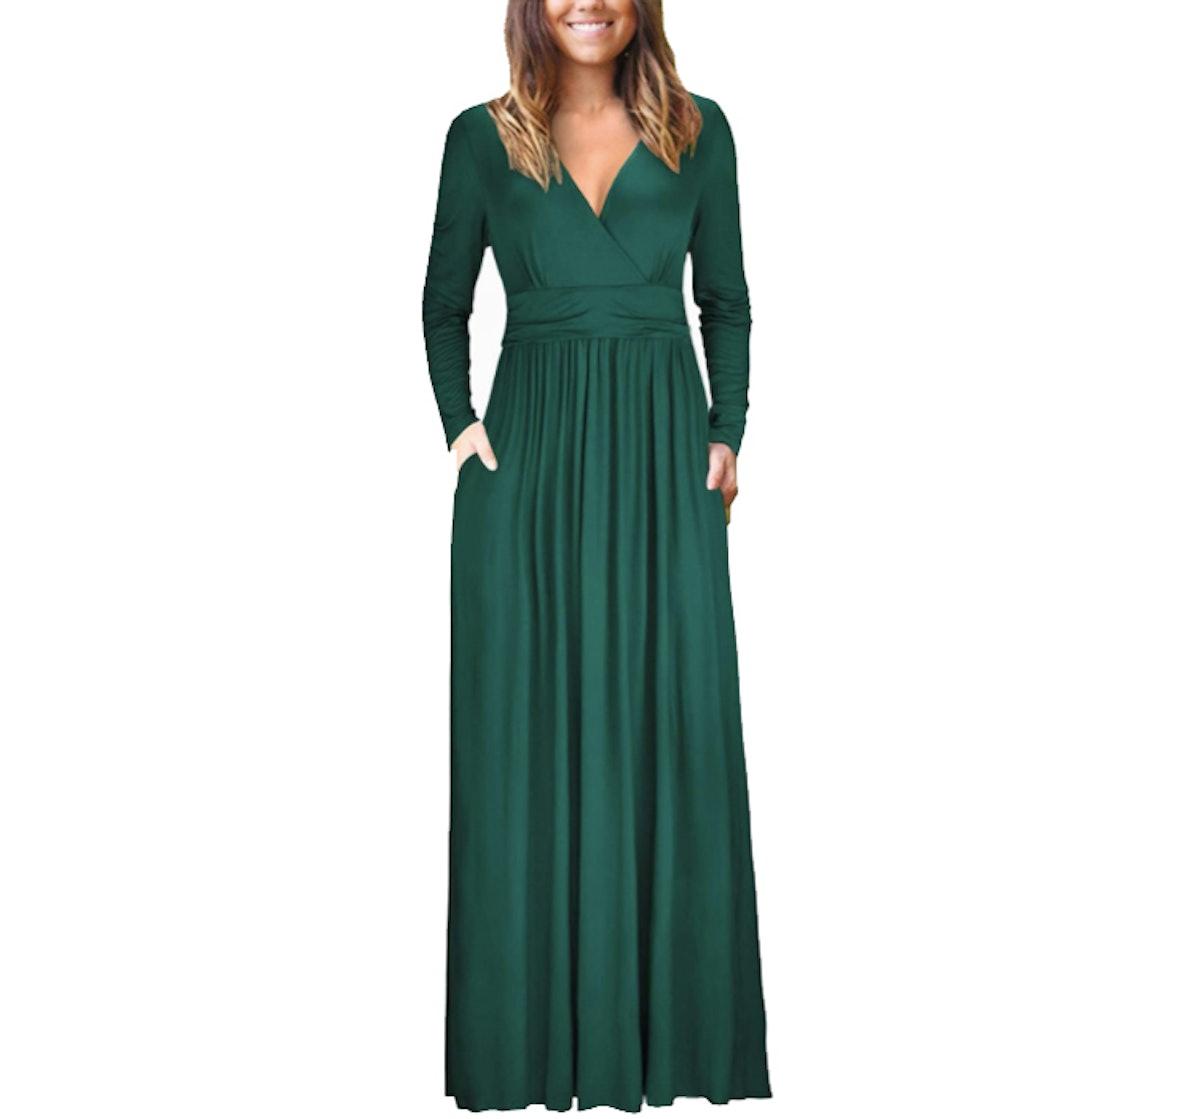 OUGES Womens Long Sleeve Maxi Dress